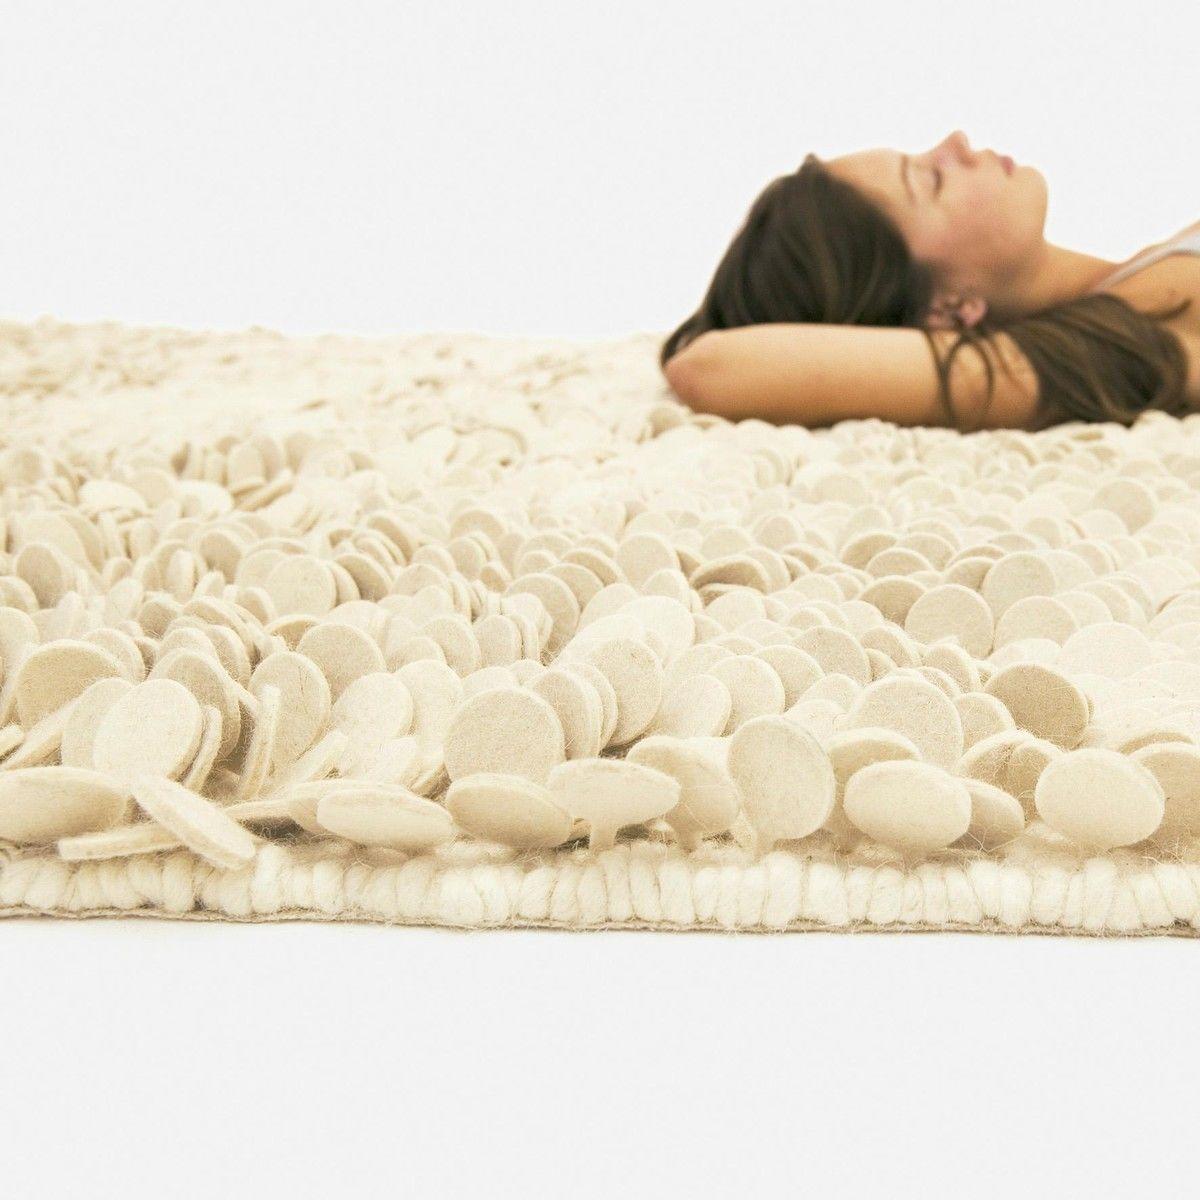 roses design tapis en feutre de laine nanimarquina. Black Bedroom Furniture Sets. Home Design Ideas